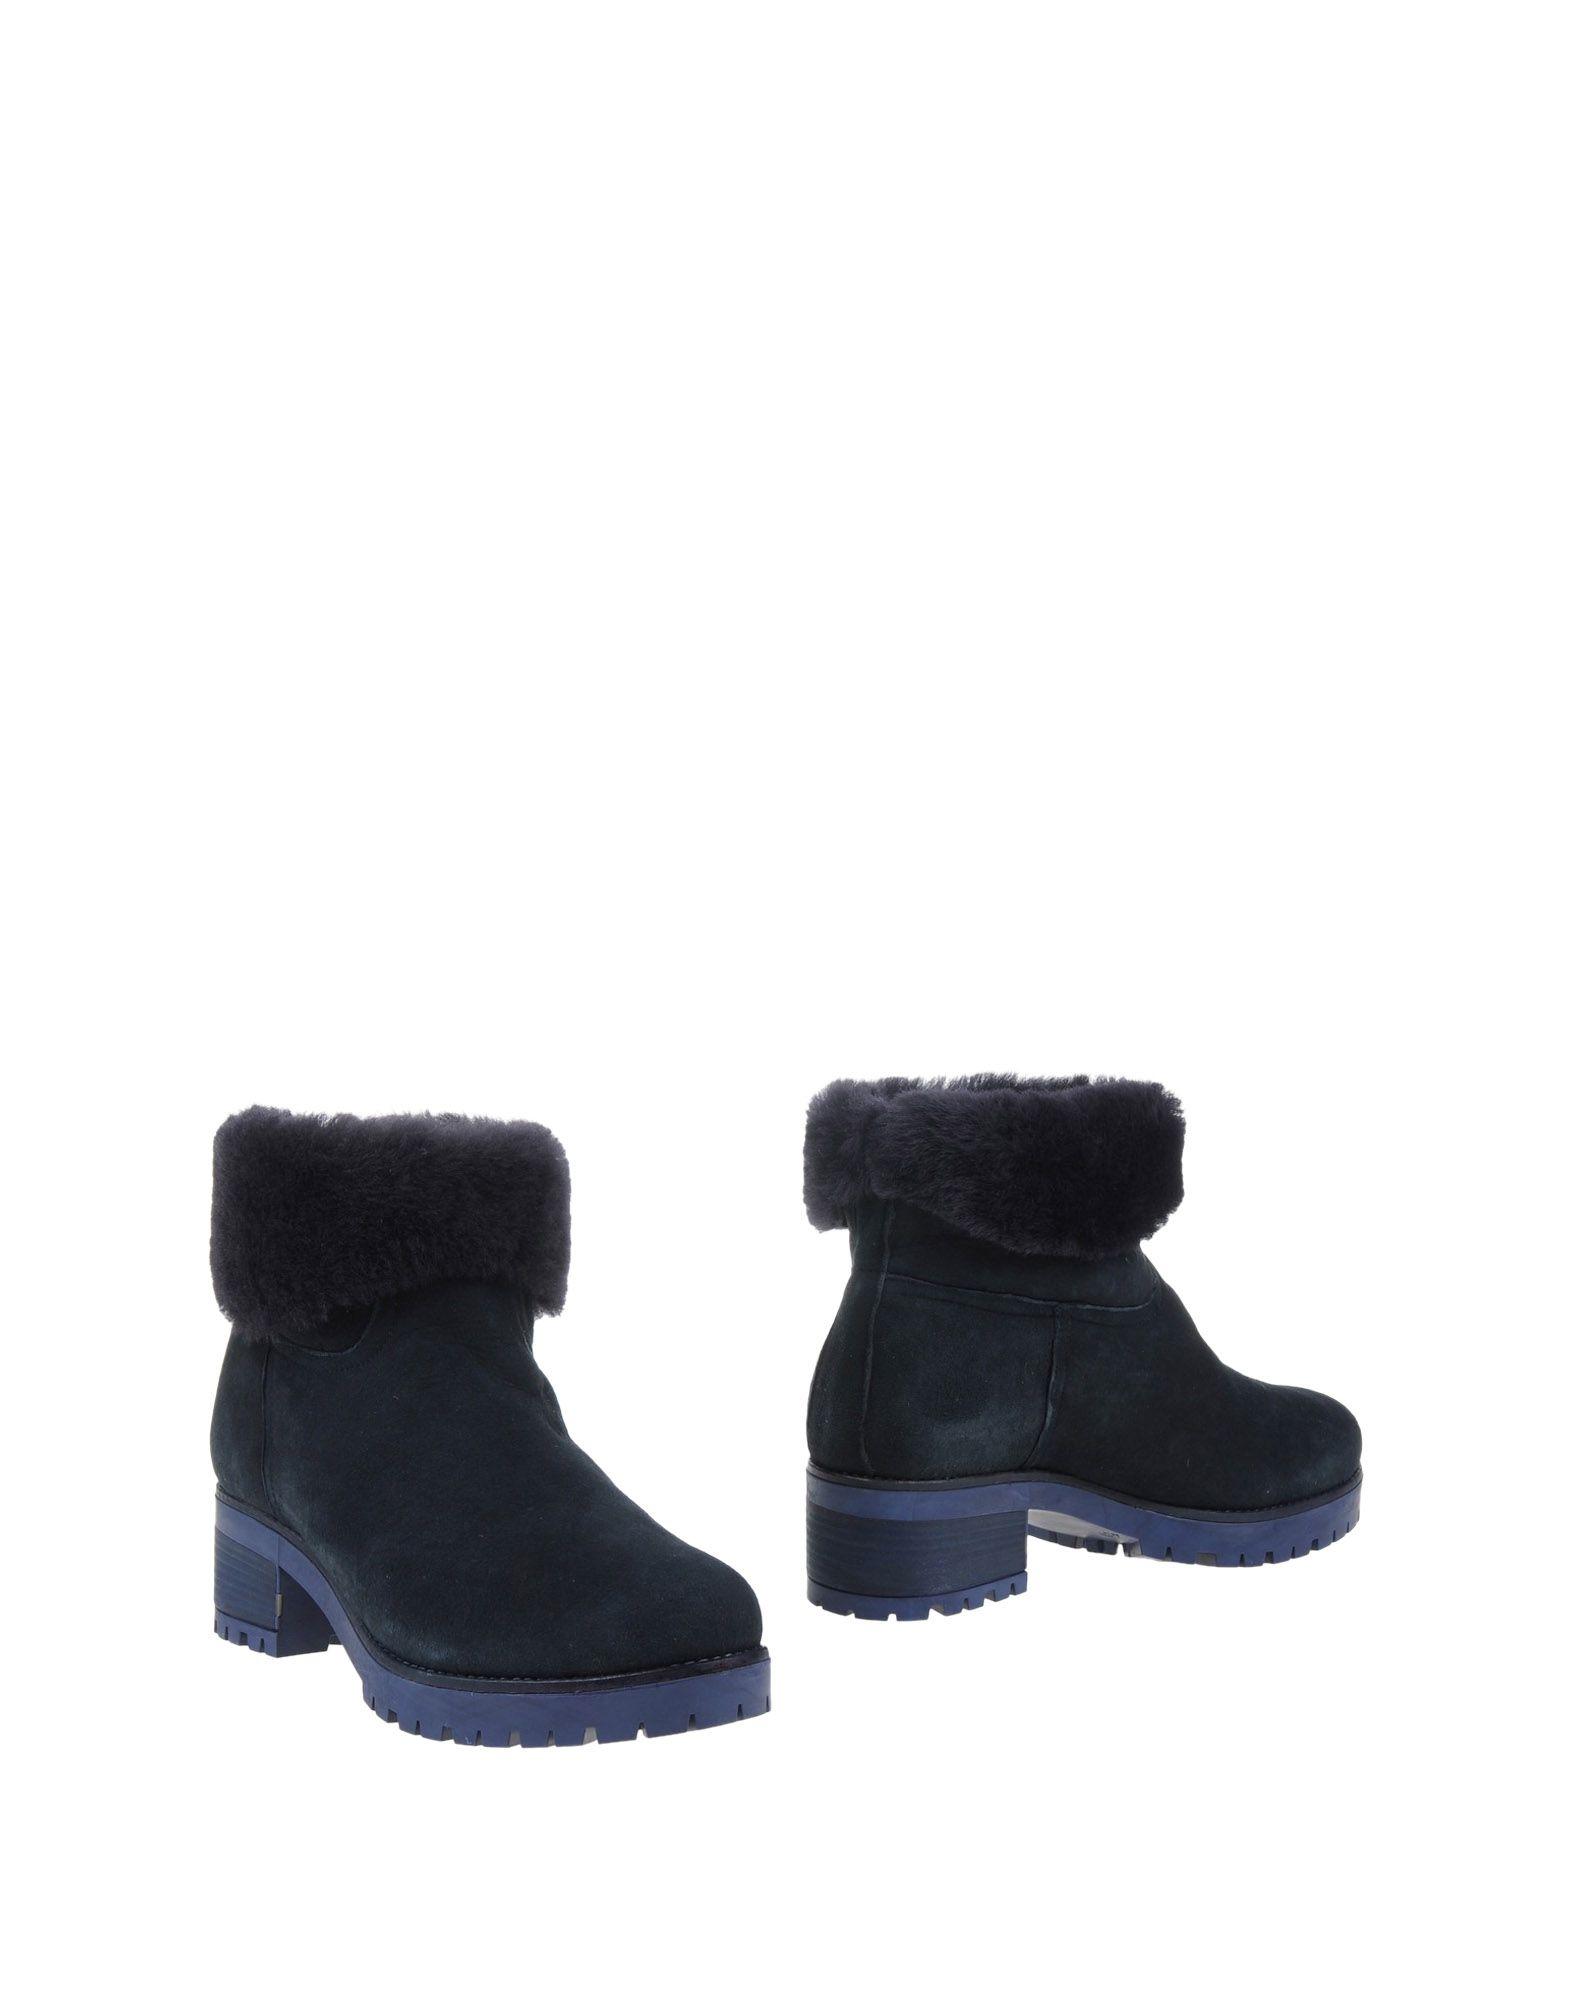 Stilvolle billige  Schuhe Entourage Stiefelette Damen  billige 11020216GJ 9e50c7